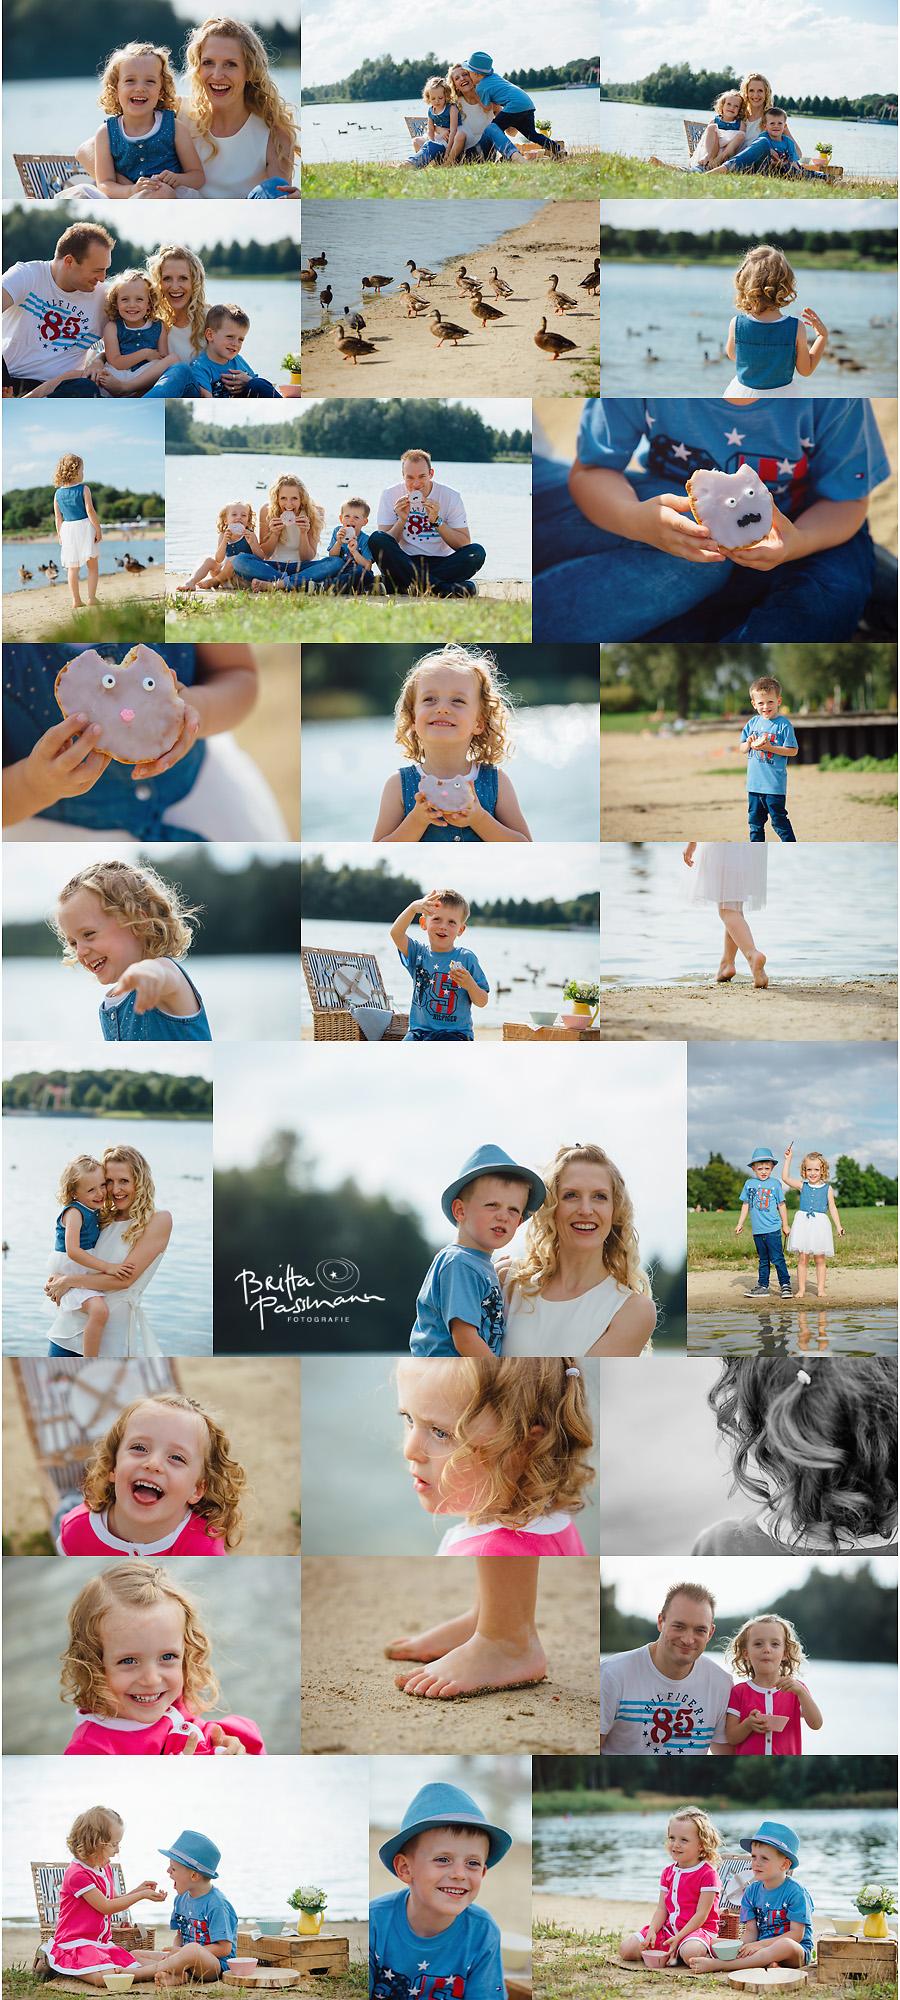 Familienpicknick_Fotoshooting_Familienfotos_Kinderfotos_Dortmund_Schwerte_21